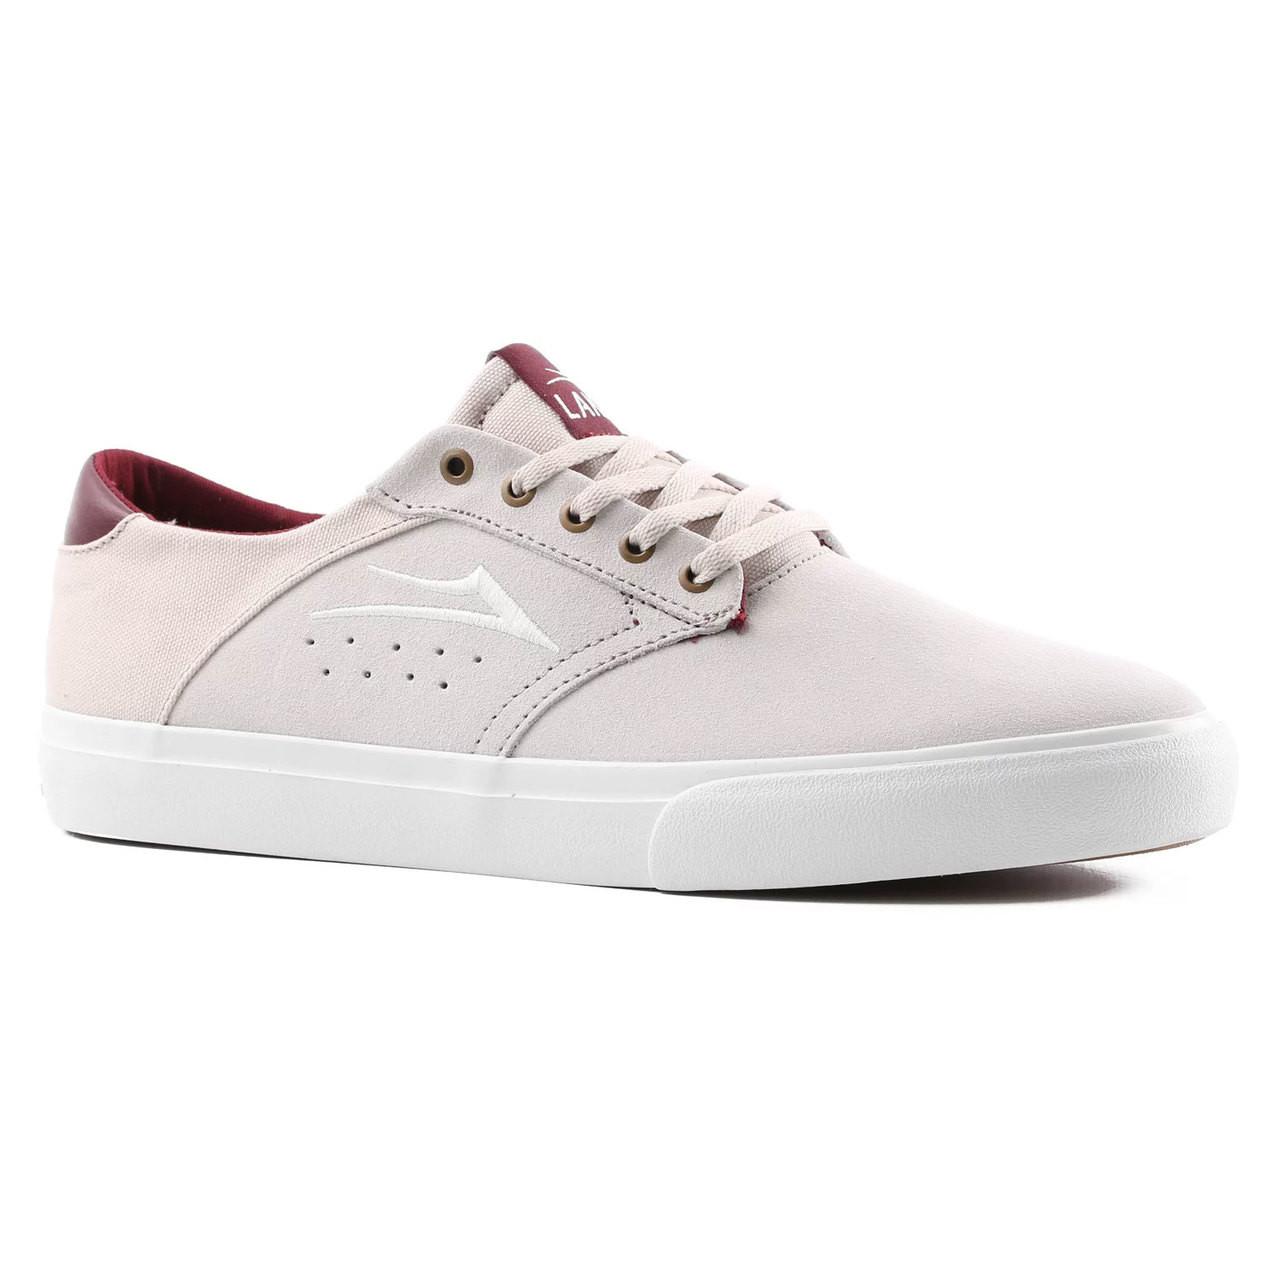 Lakai Skateboard Shoes Porter White Suede